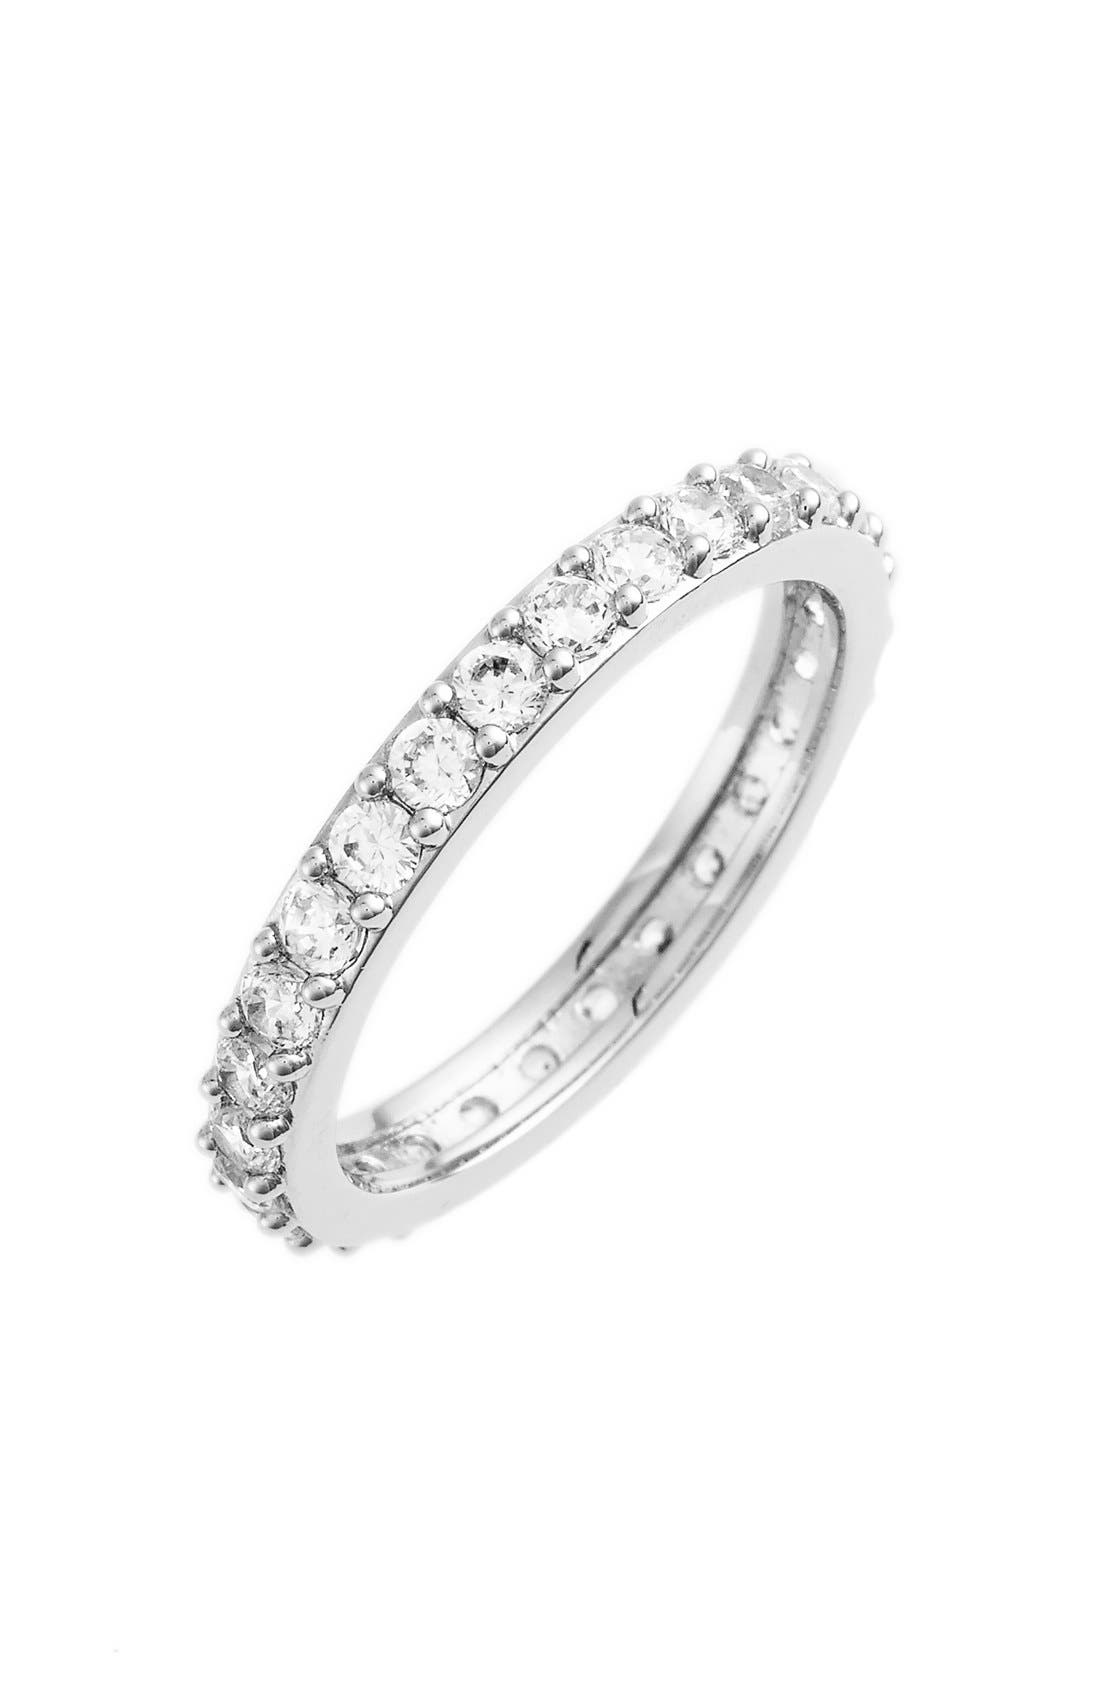 Main Image - Nadri Cubic Zirconia Pavé Band Ring